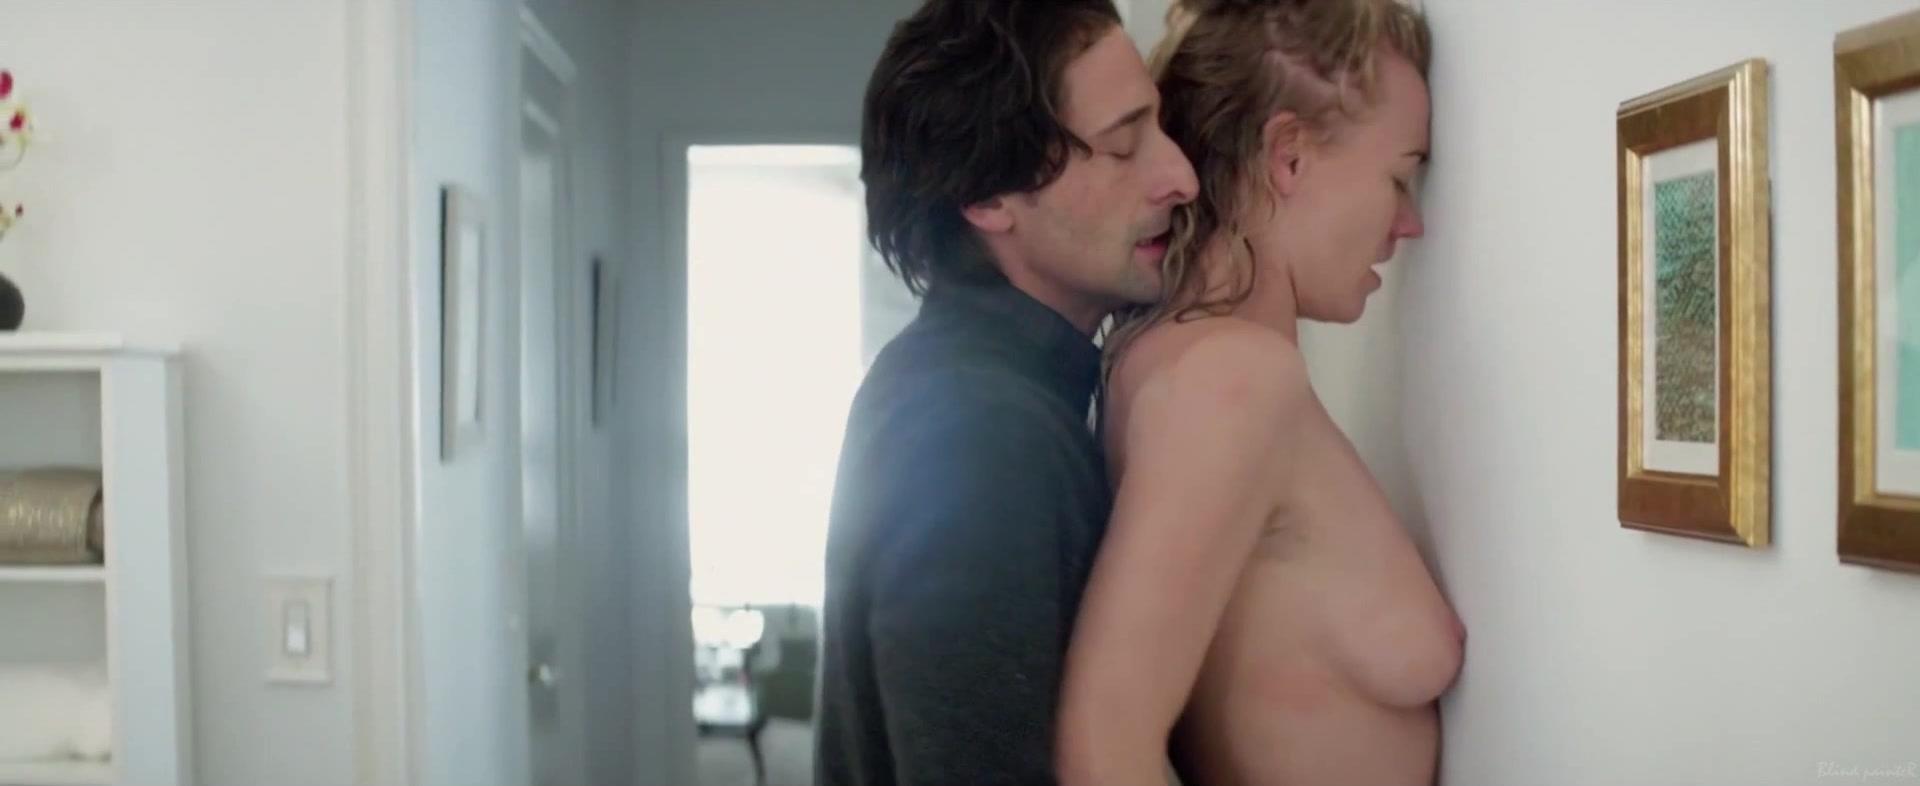 Public sex nude photos of yvonne strahovski female ass naked